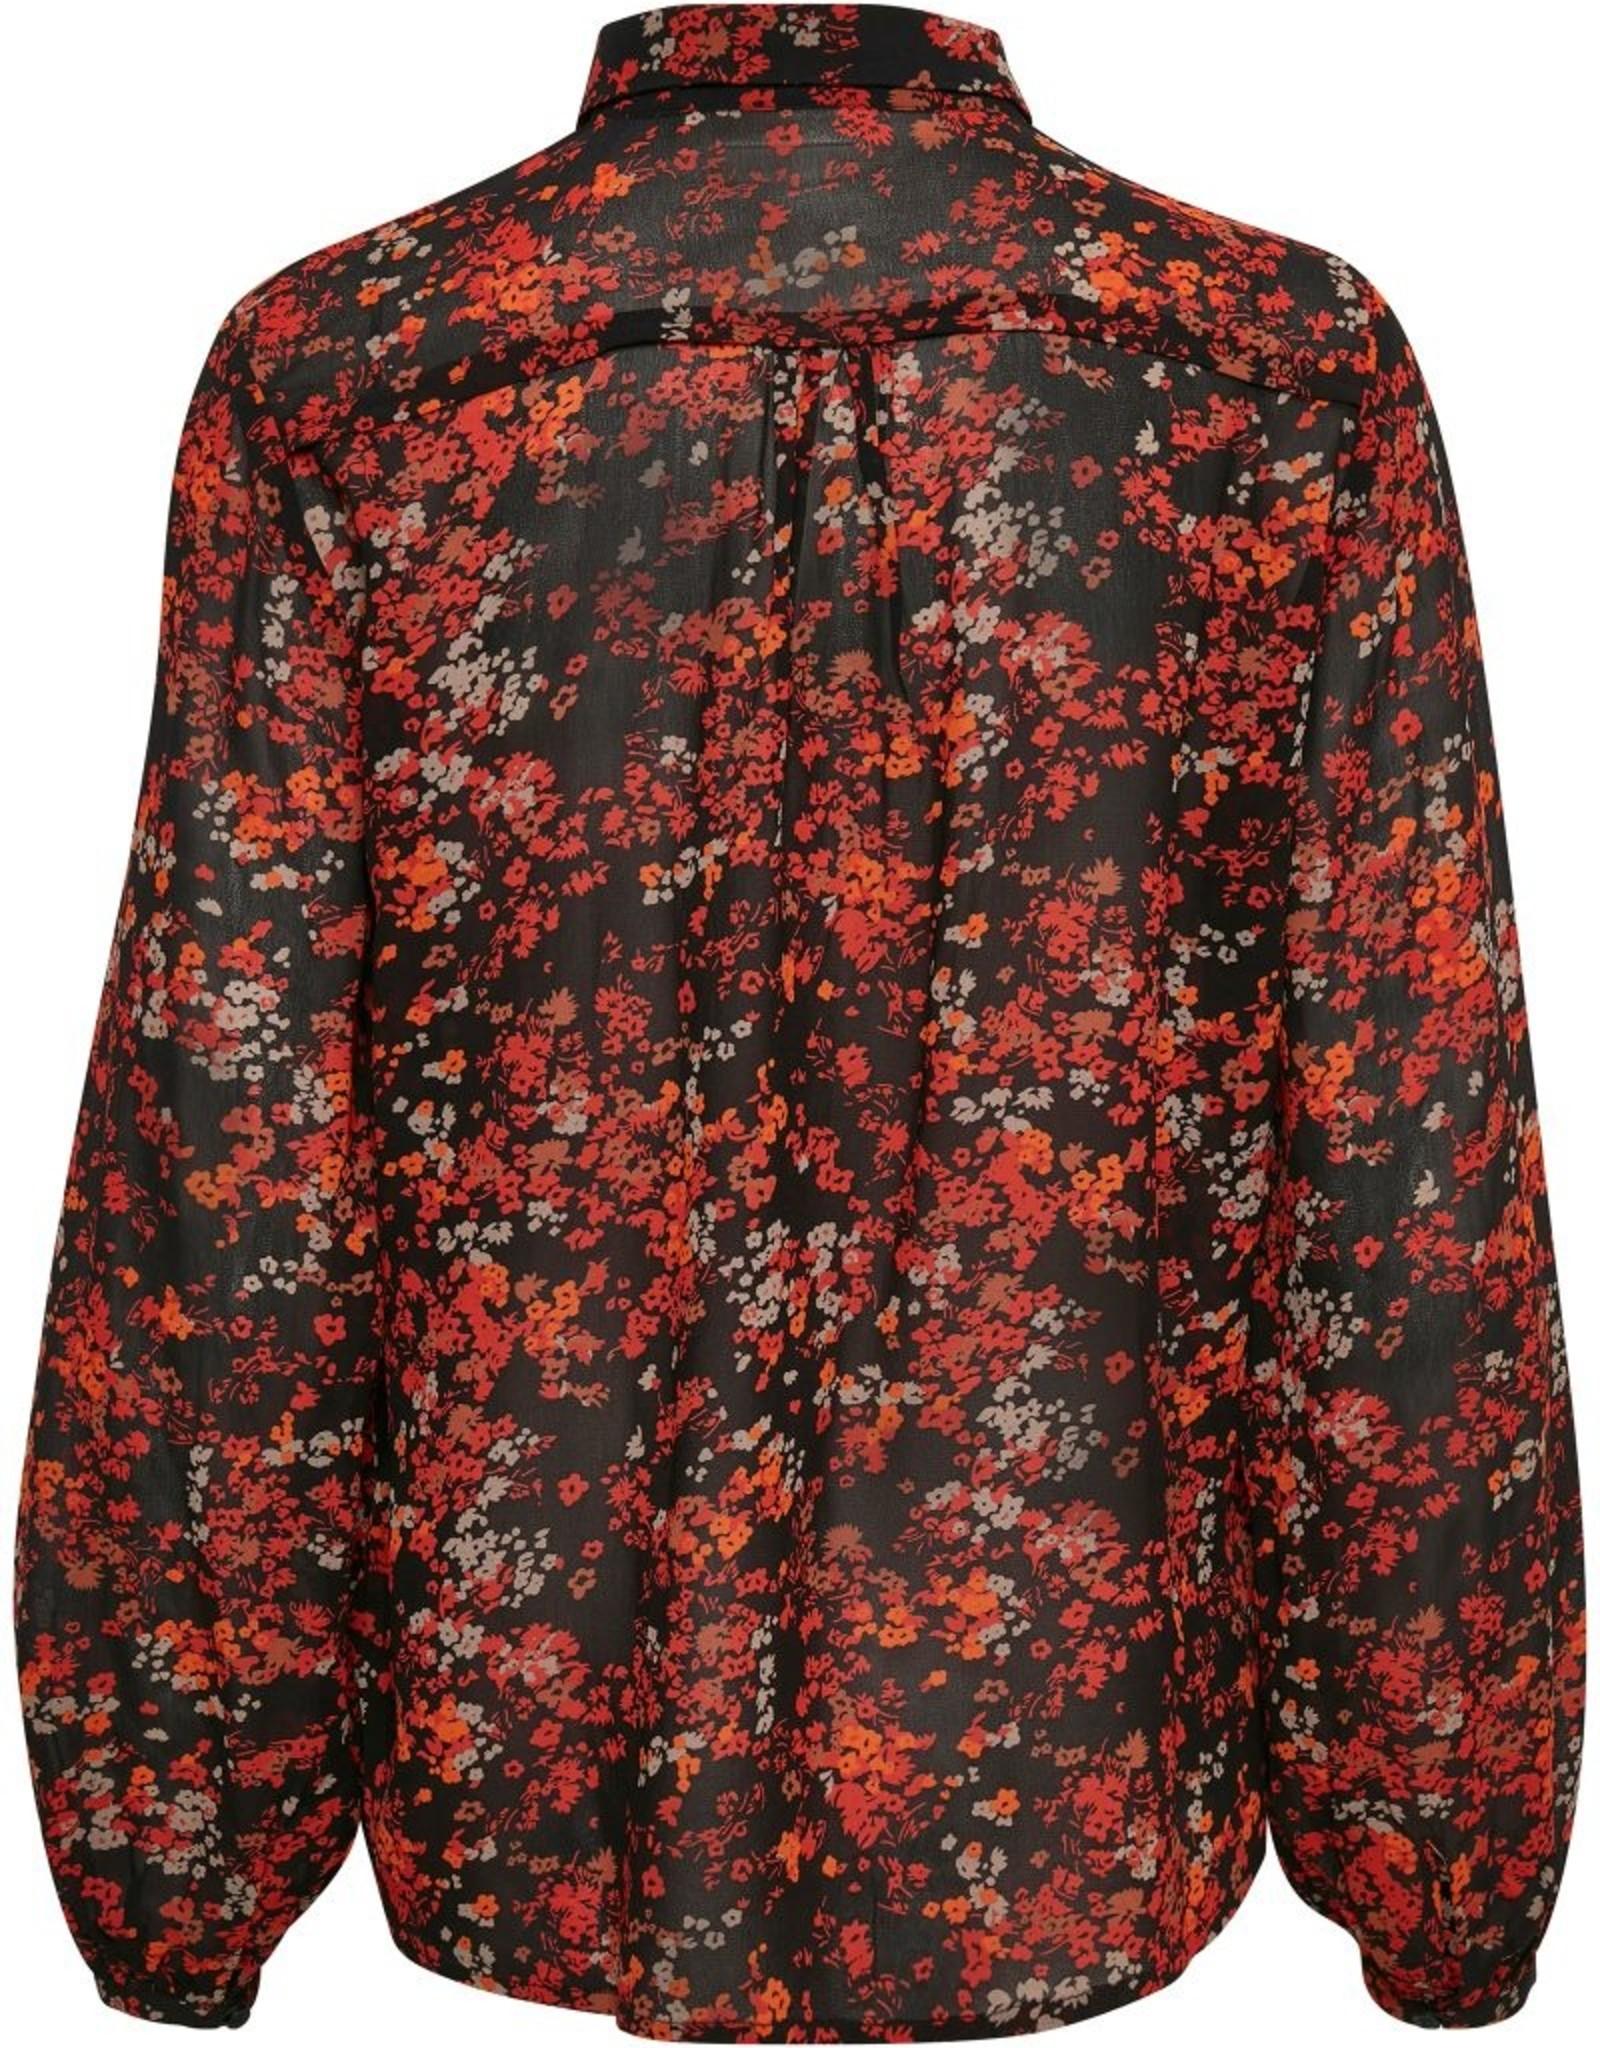 InWear Barbel Shirt Red Dried Flower